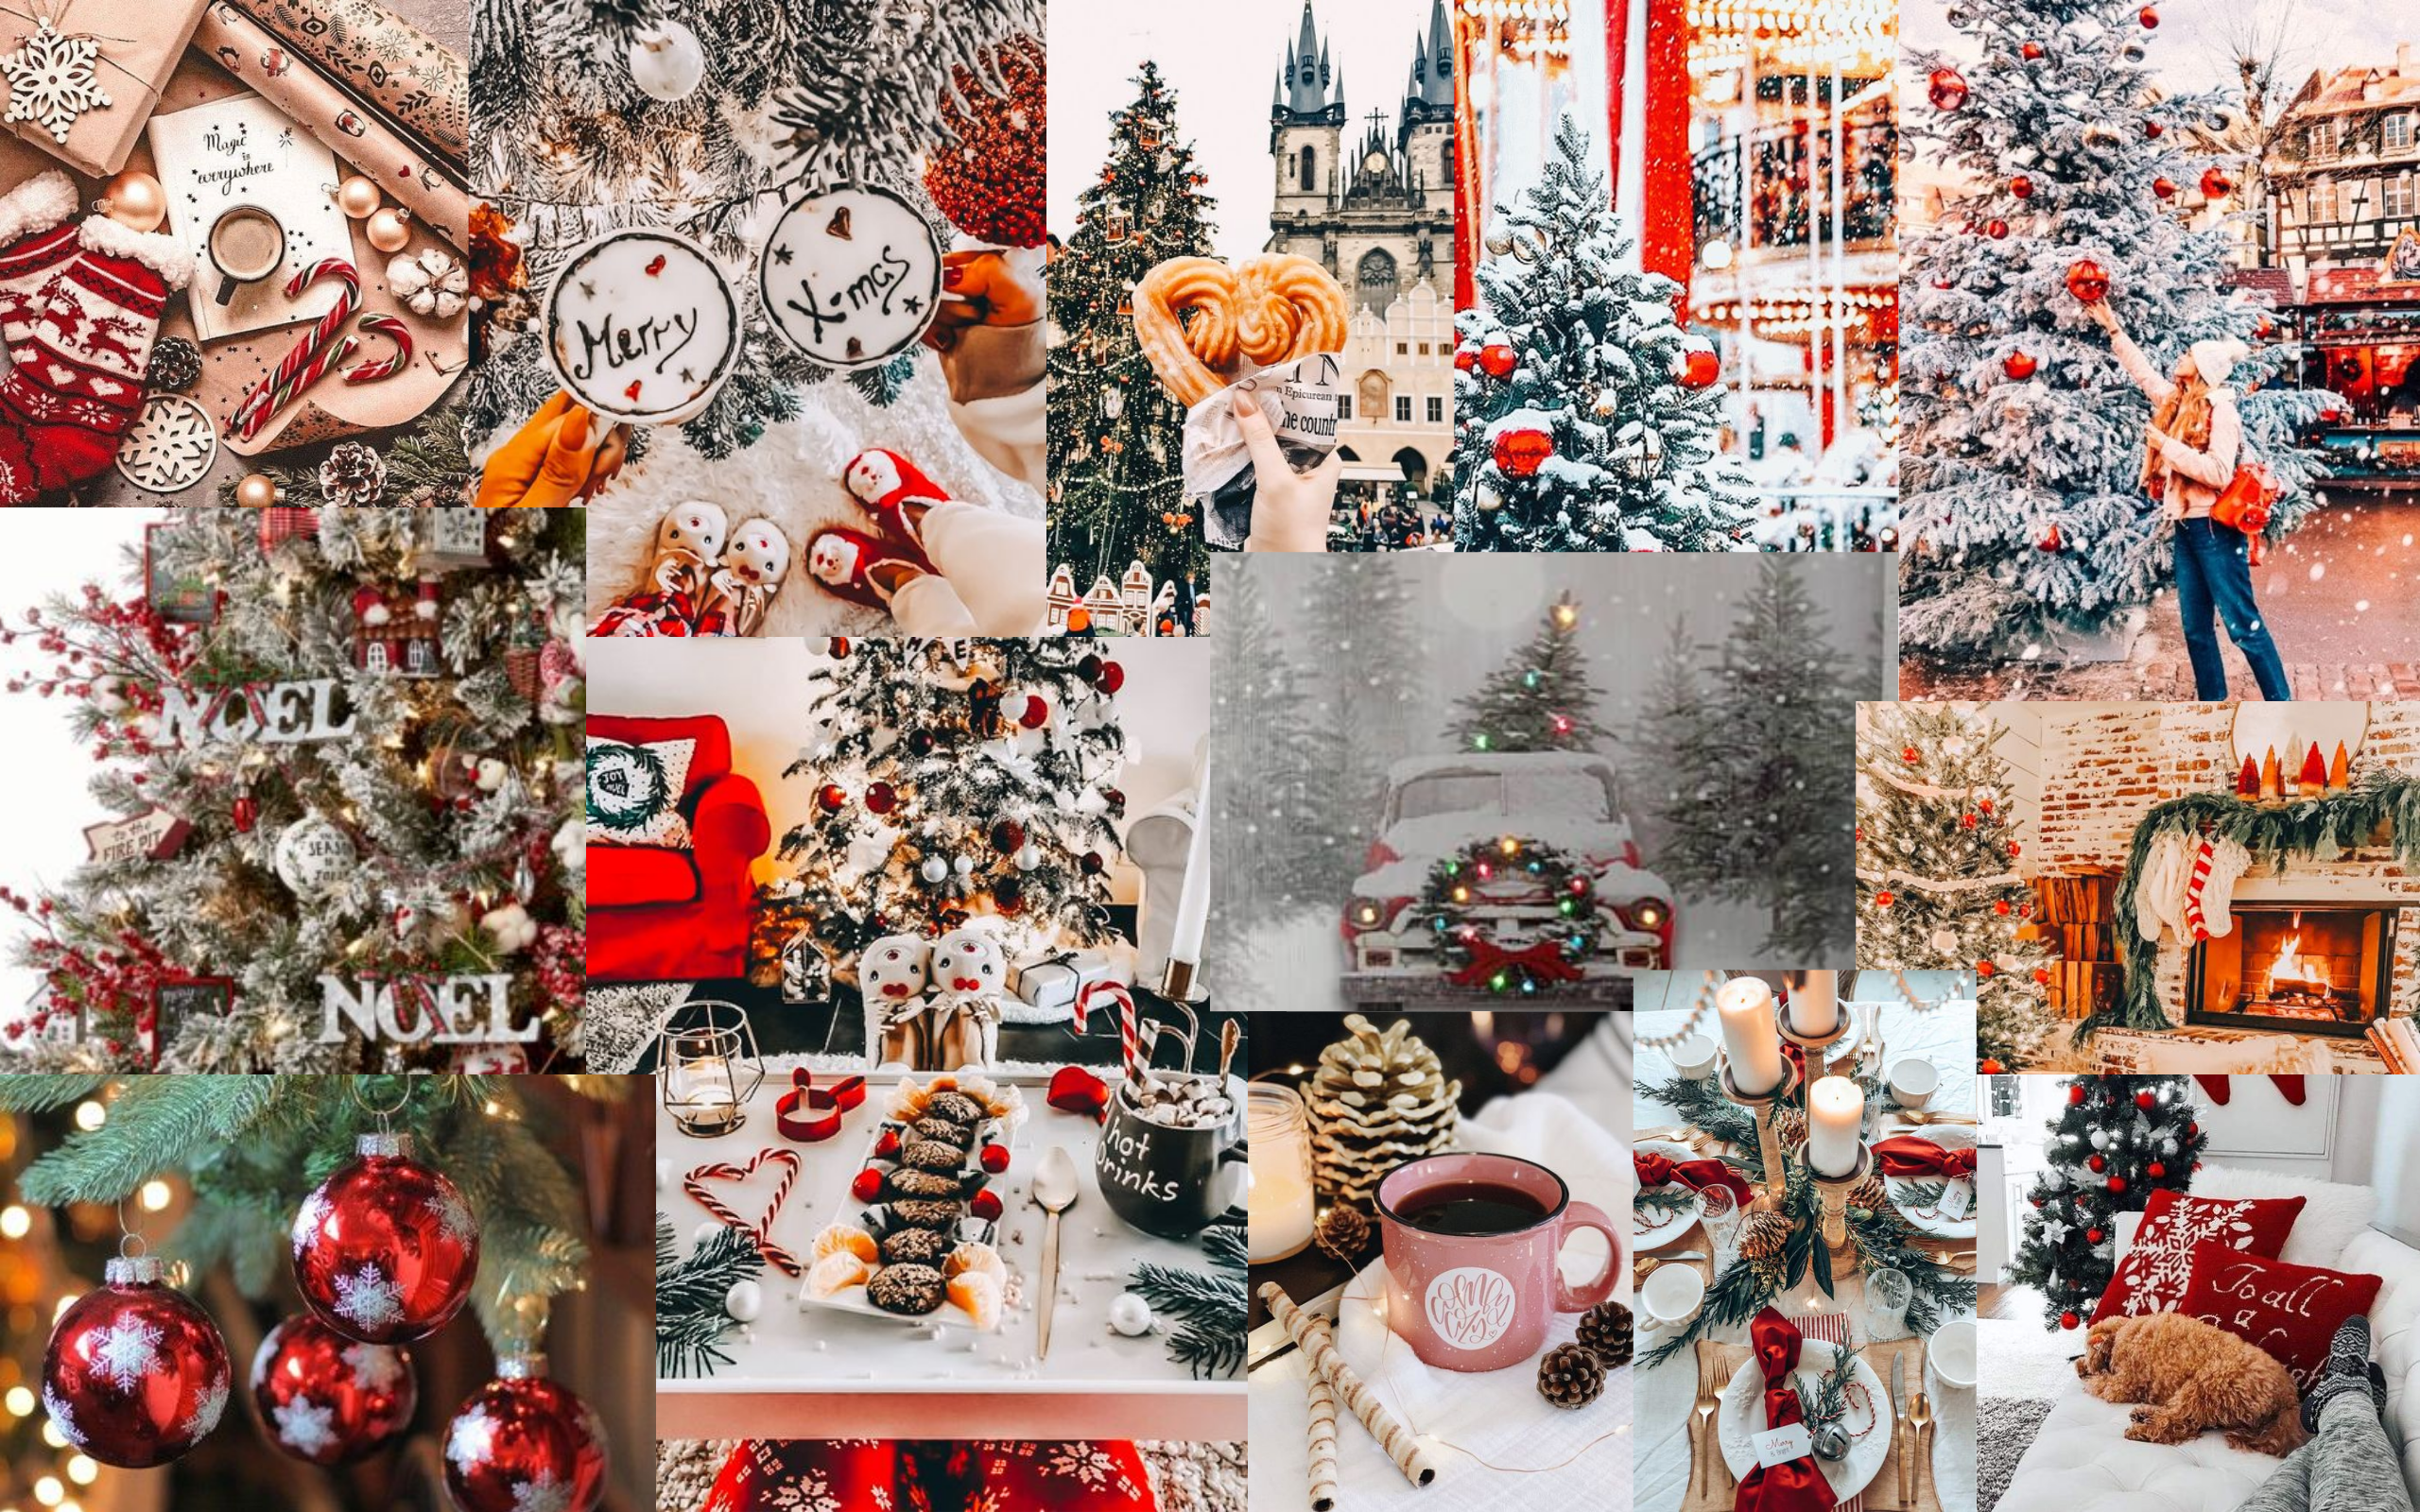 Christmas Collage For Computer Desktop Wallpaper Wallpaper Iphone Christmas Christmas Desktop Wallpaper Christmas Wallpaper Backgrounds